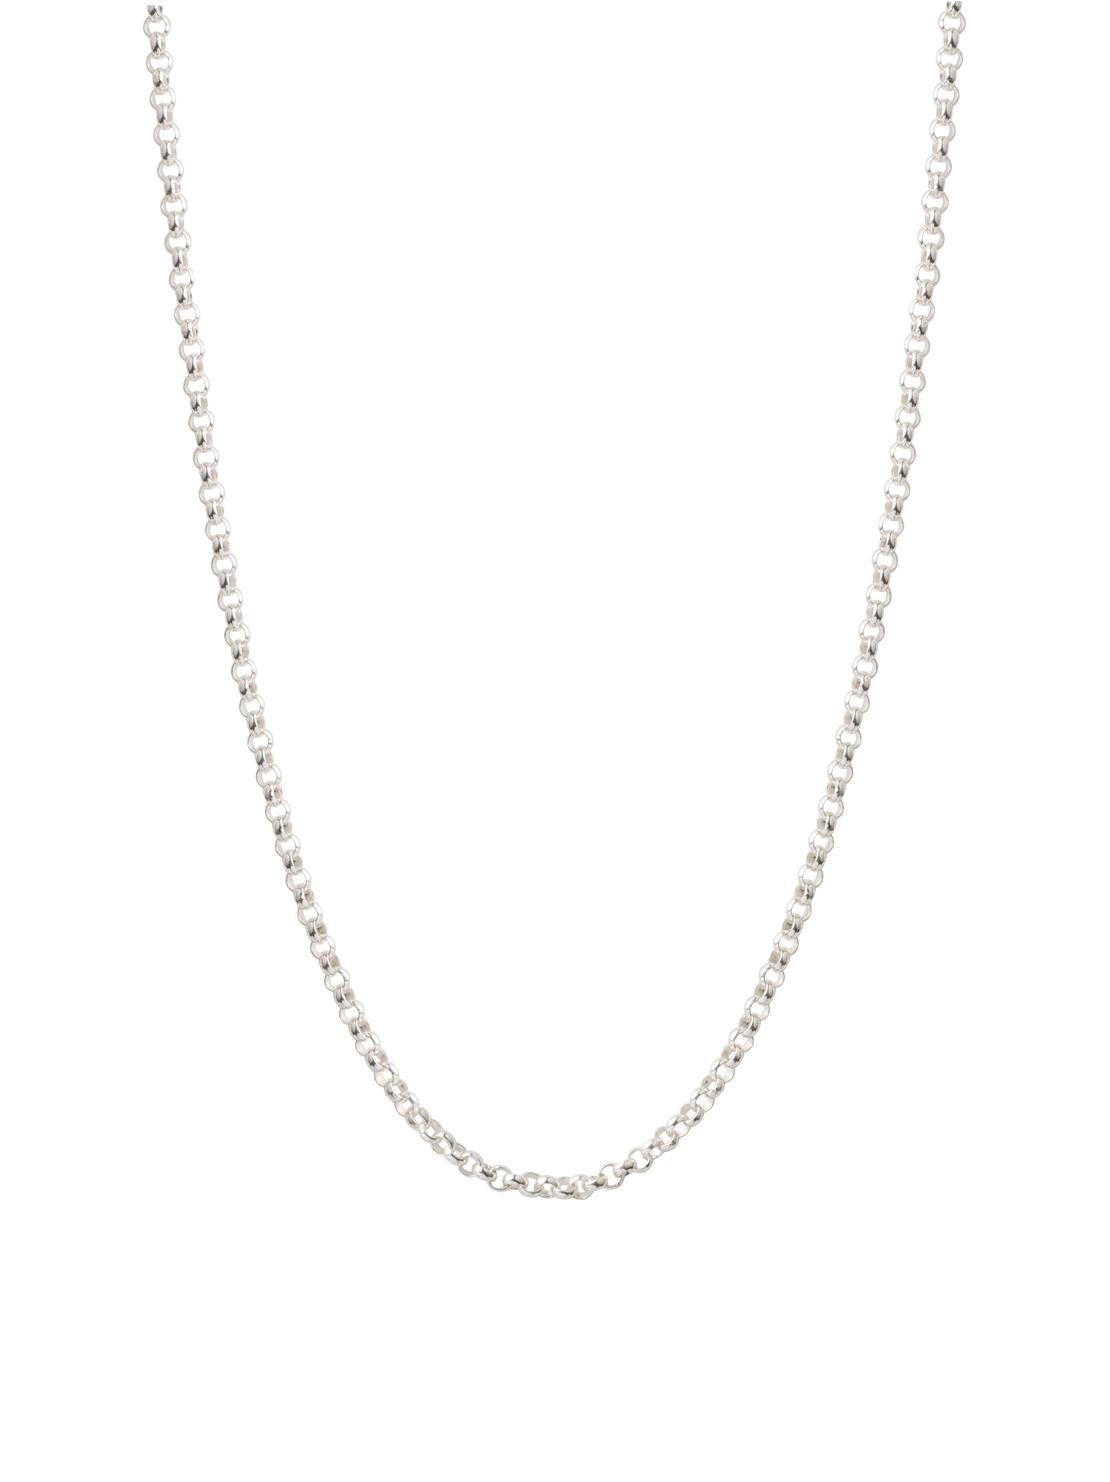 50cm Silver Belcher Chain